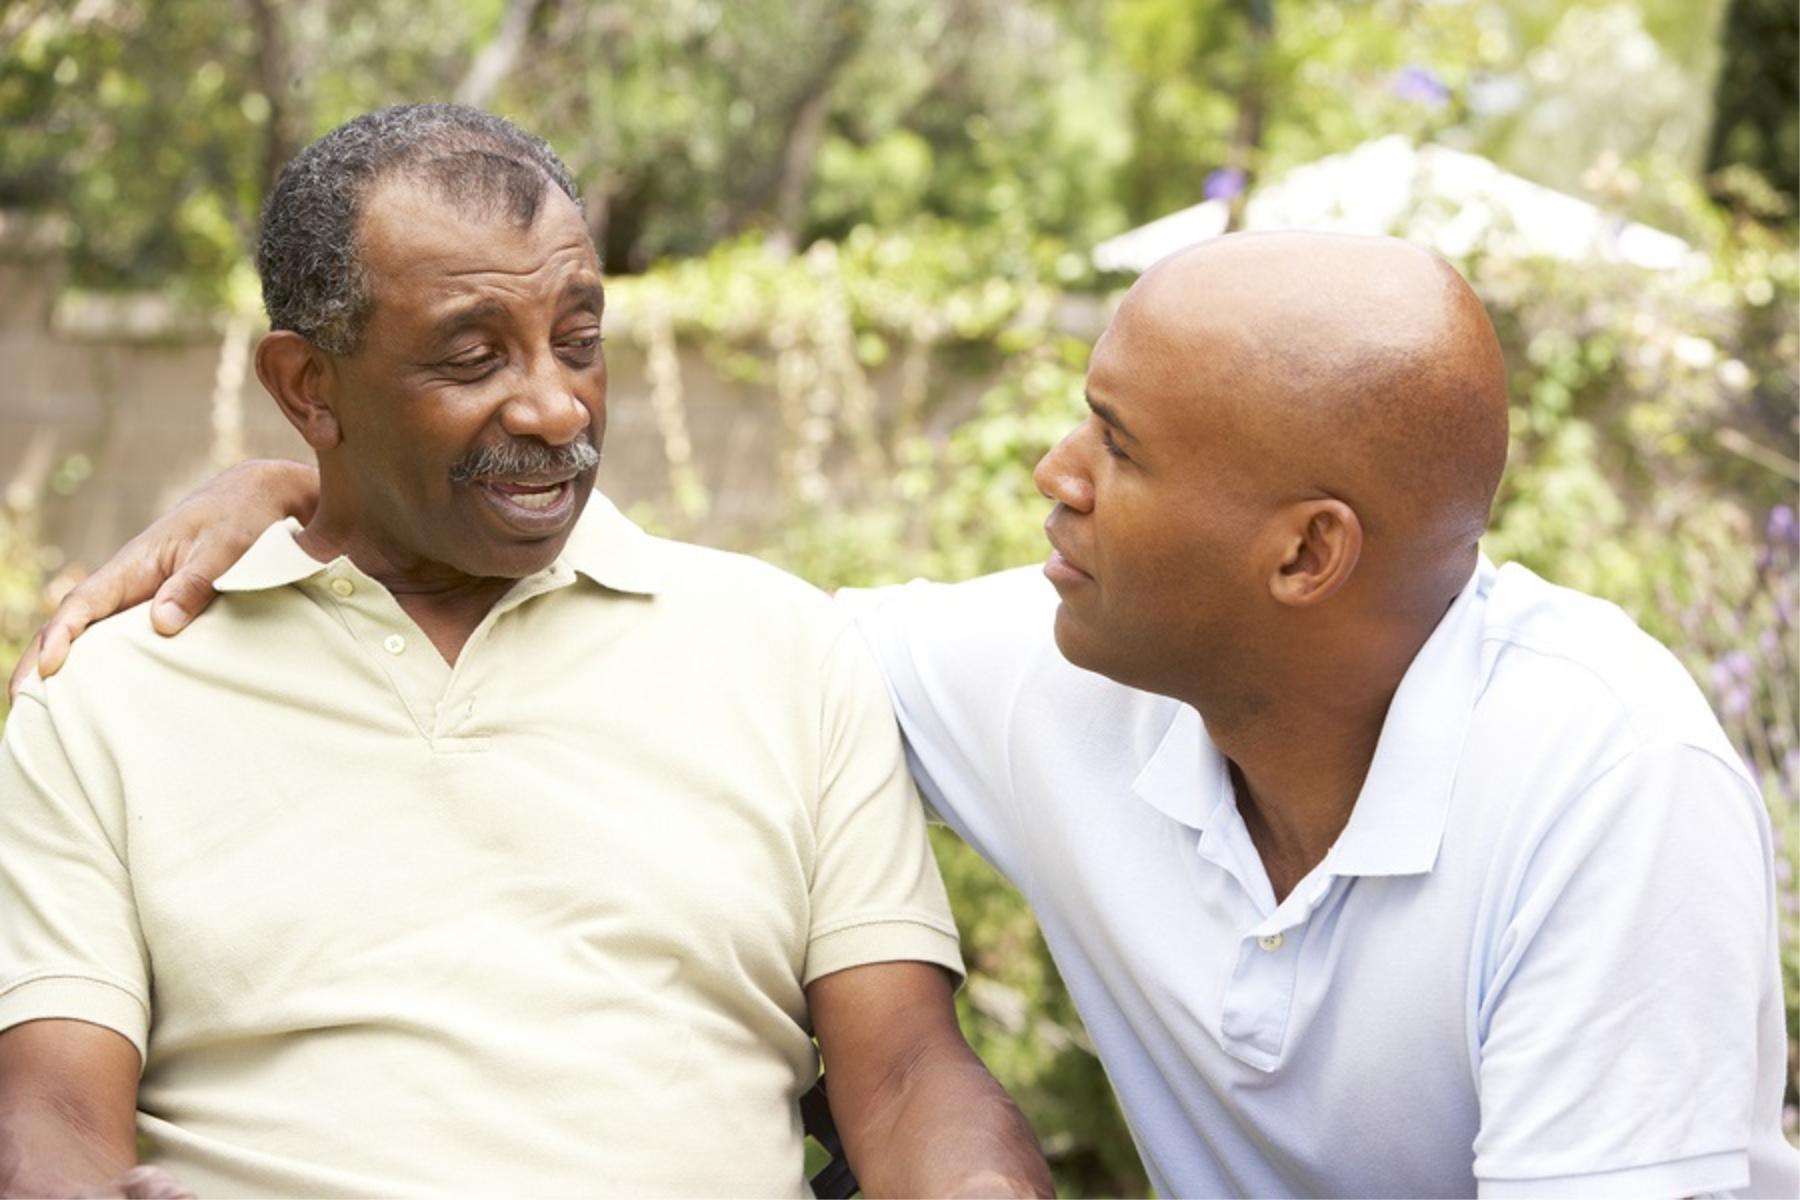 Elderly Care in Surprise AZ: Talking About Senior Care